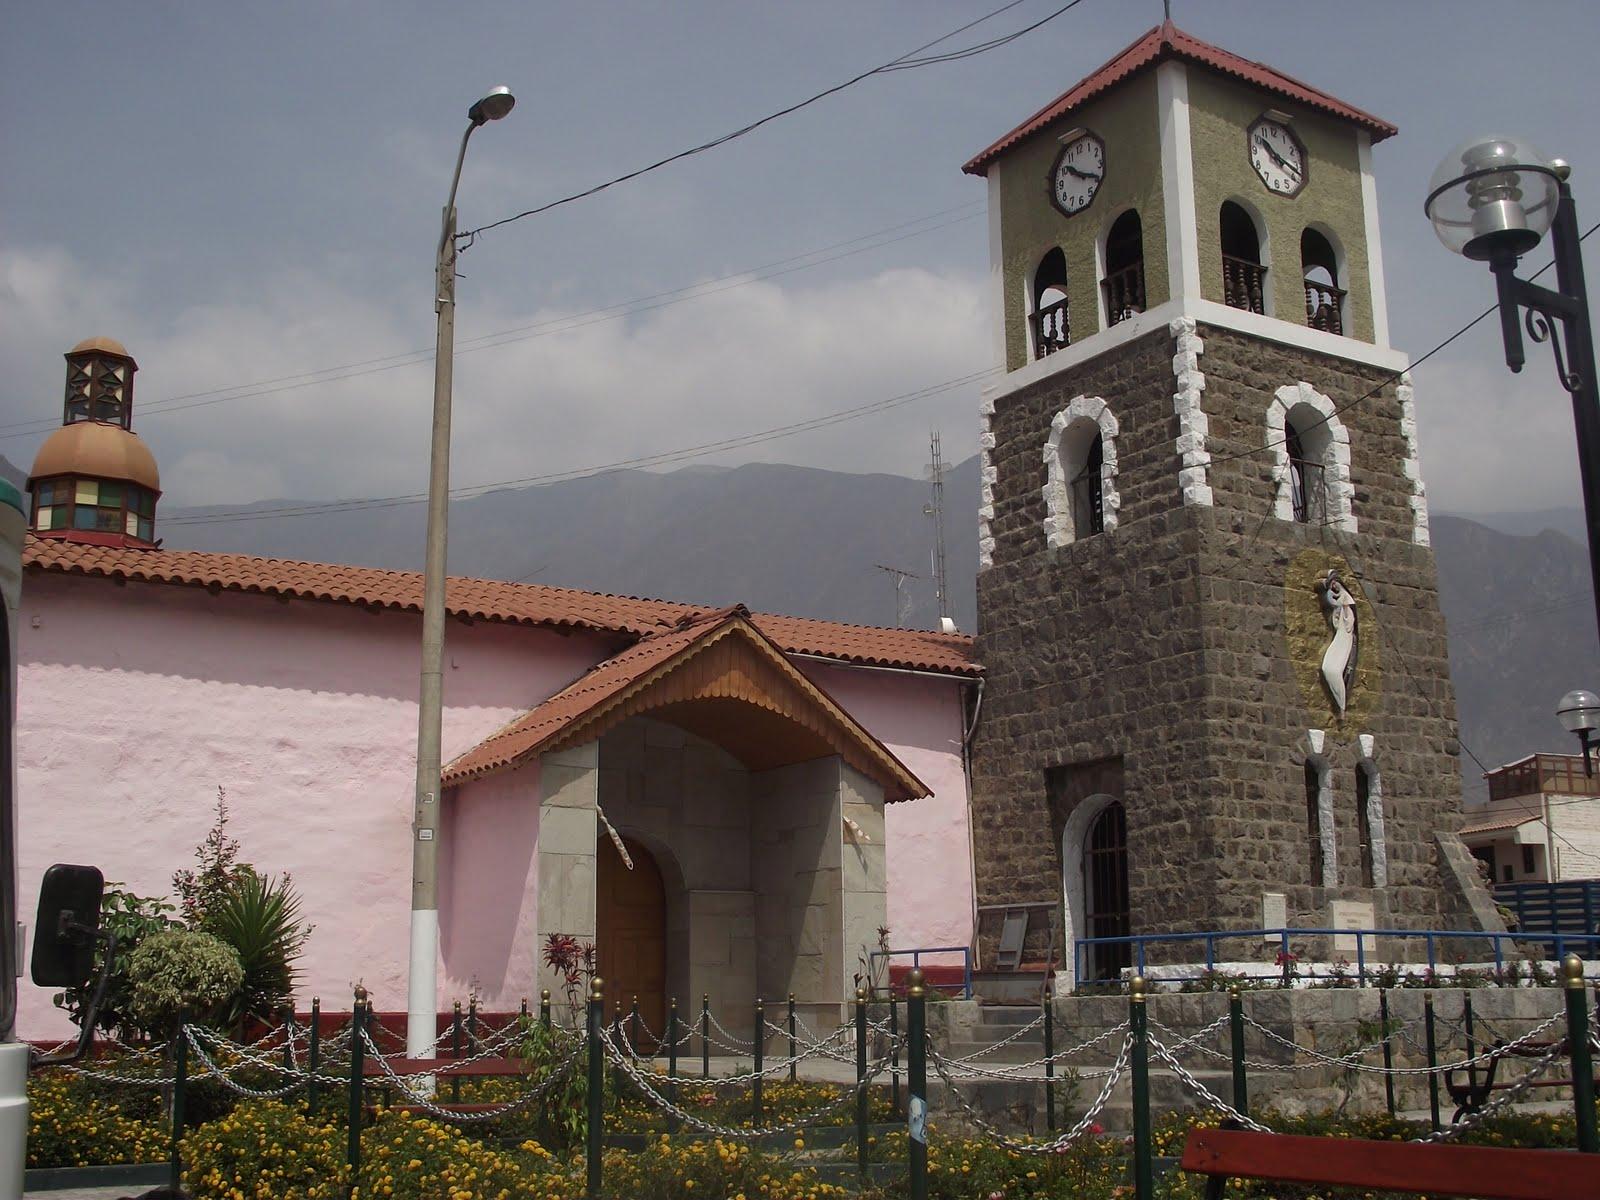 Callahuanca